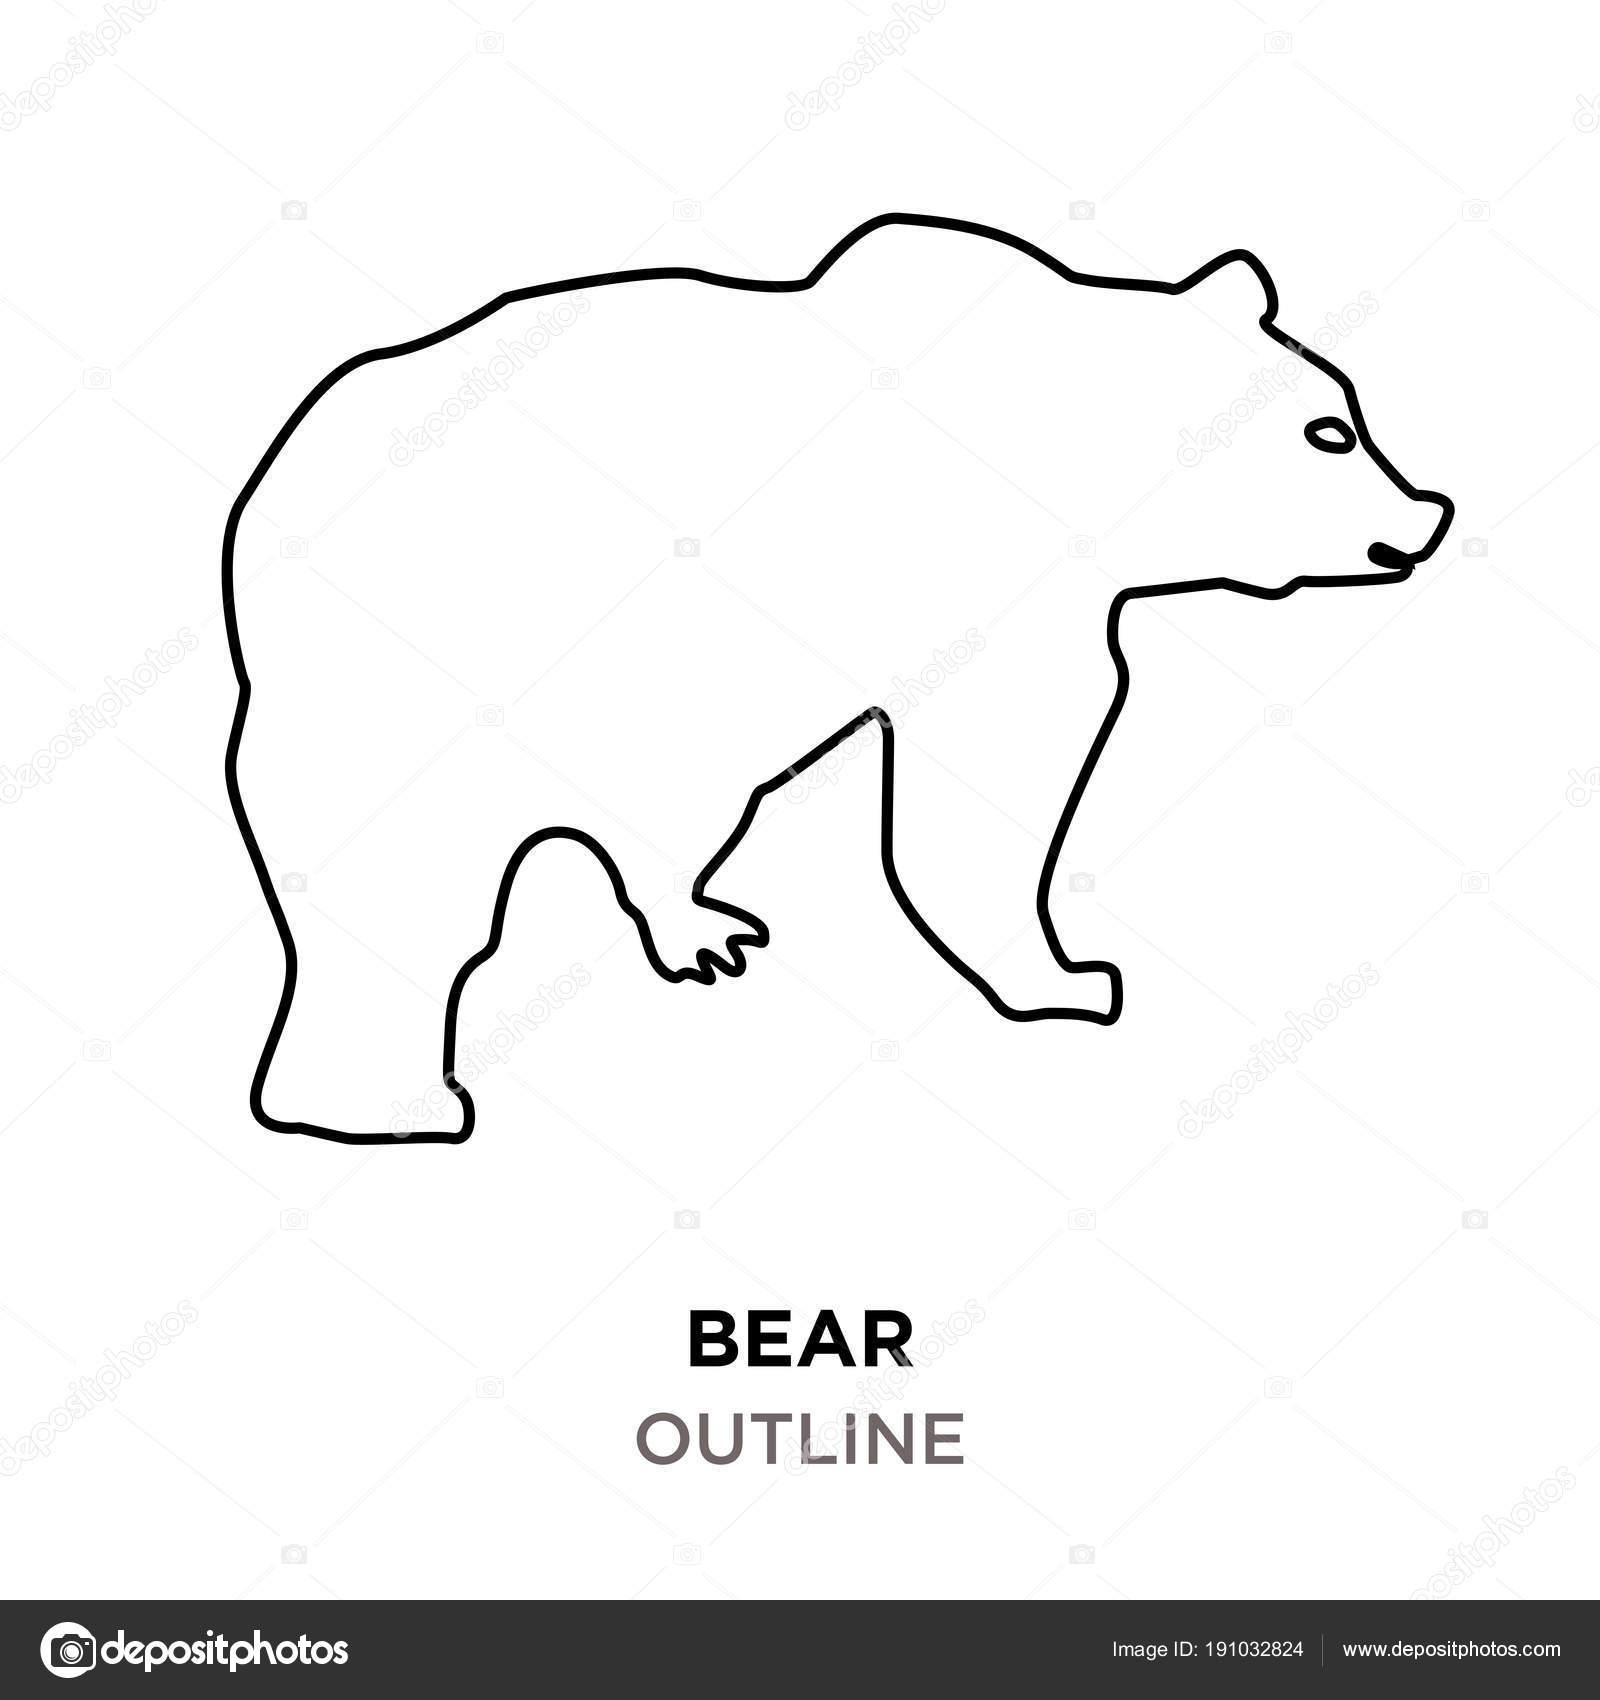 bear outline clipart on white background stock vector - Outline Of A Bear